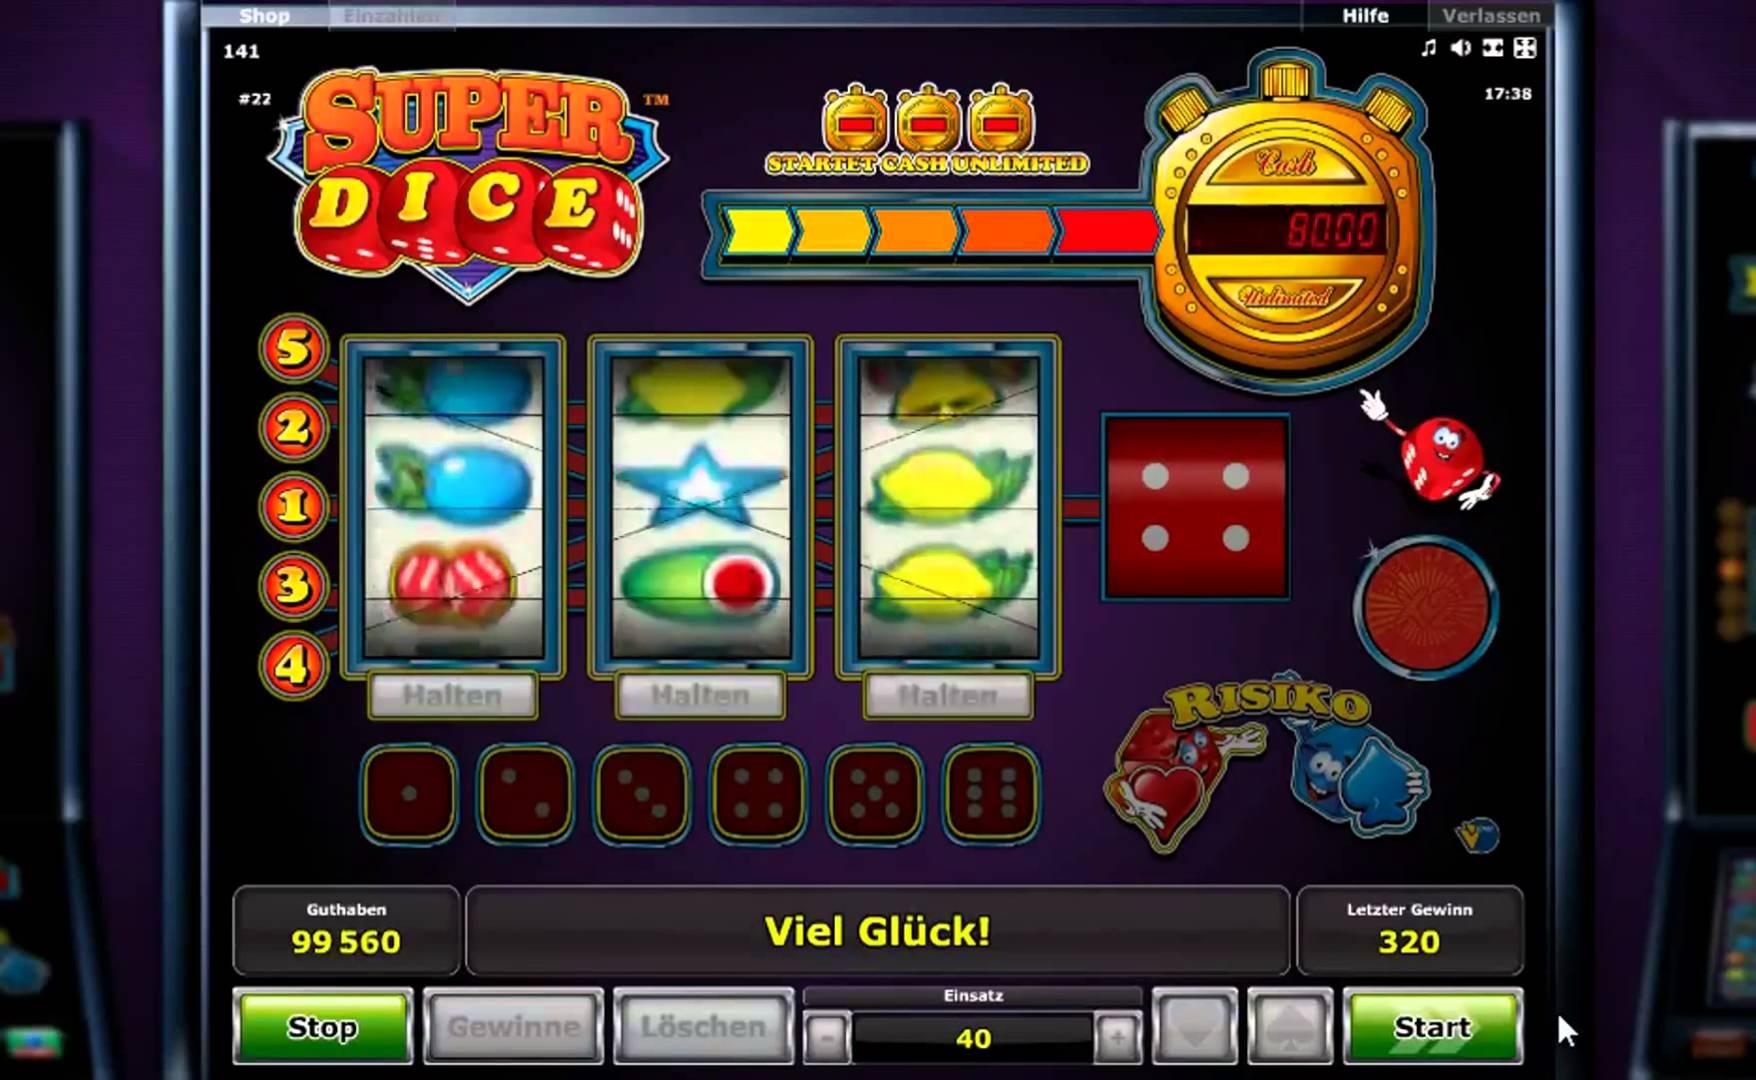 Online Novoline Casino Gratis Casino Spiele Ohne Anmeldung